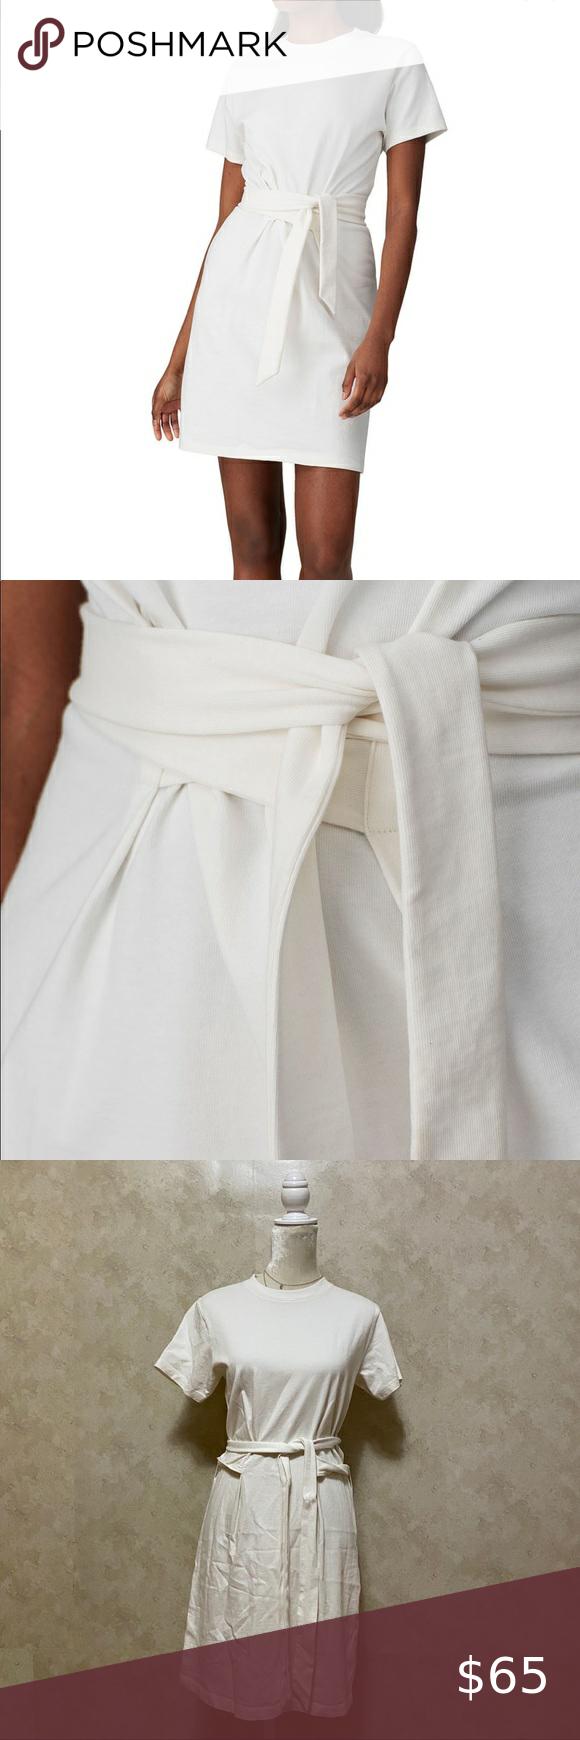 Vince White Short Sleeve Tie Waist Mini Dress S Mini Dress White Shorts Vince Dress [ 1740 x 580 Pixel ]